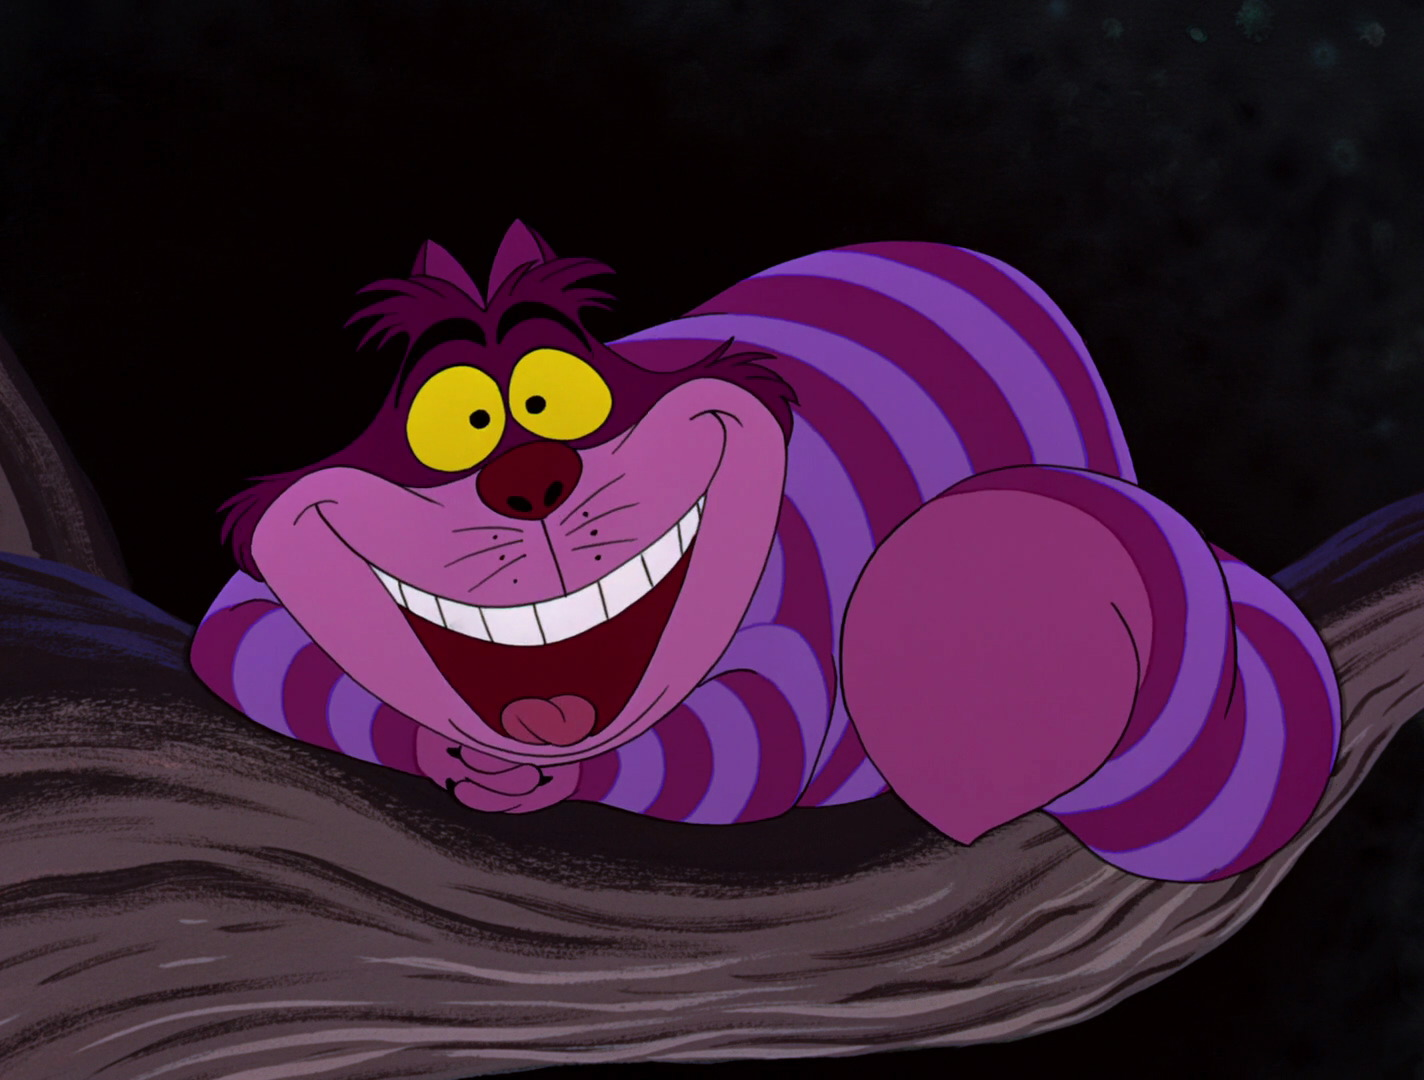 Alice in Wonderland Alice In Wonderland Characters Original Cat